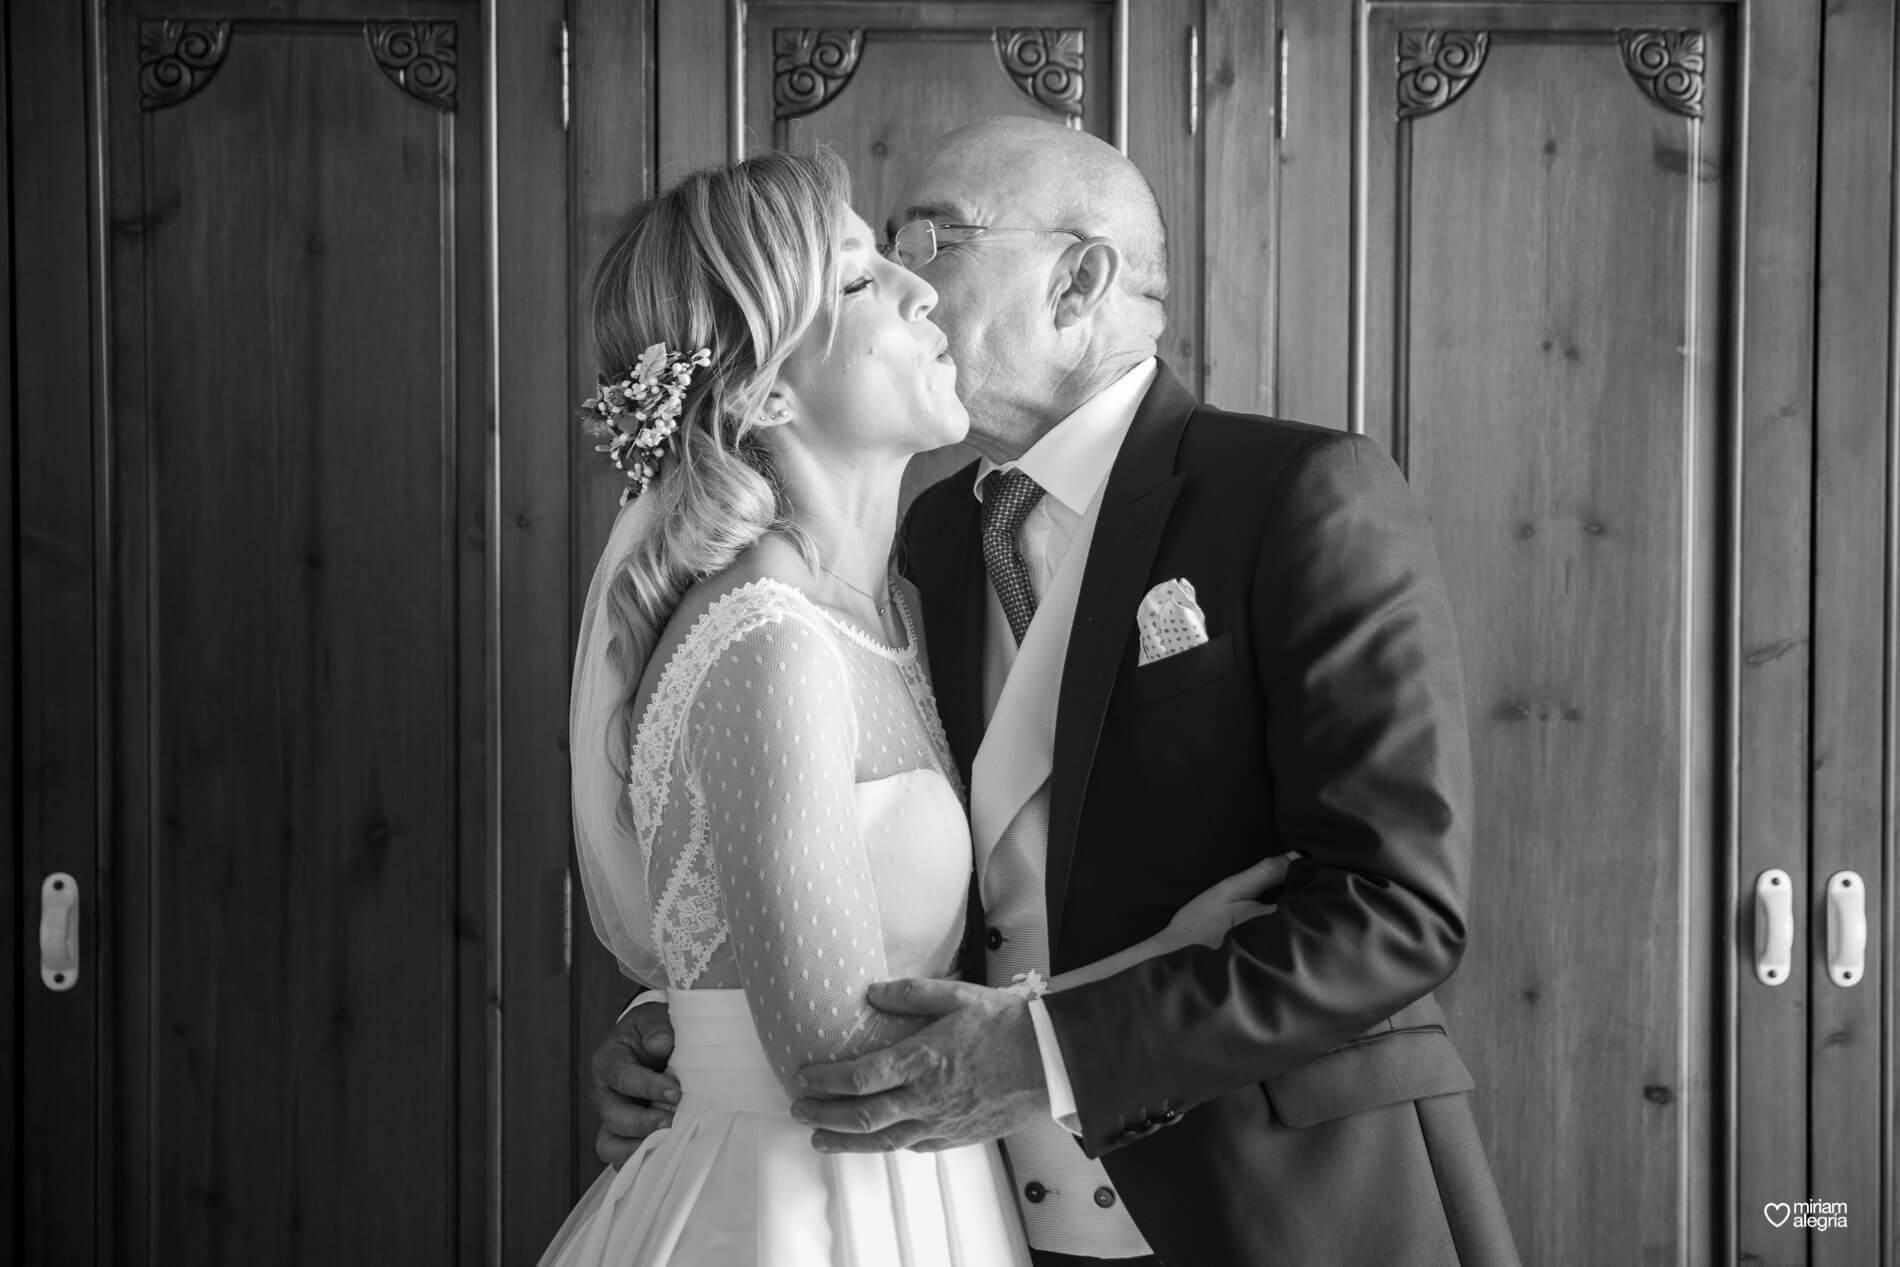 la-boda-de-alemc7-miriam-alegria-fotografos-boda-murcia-38